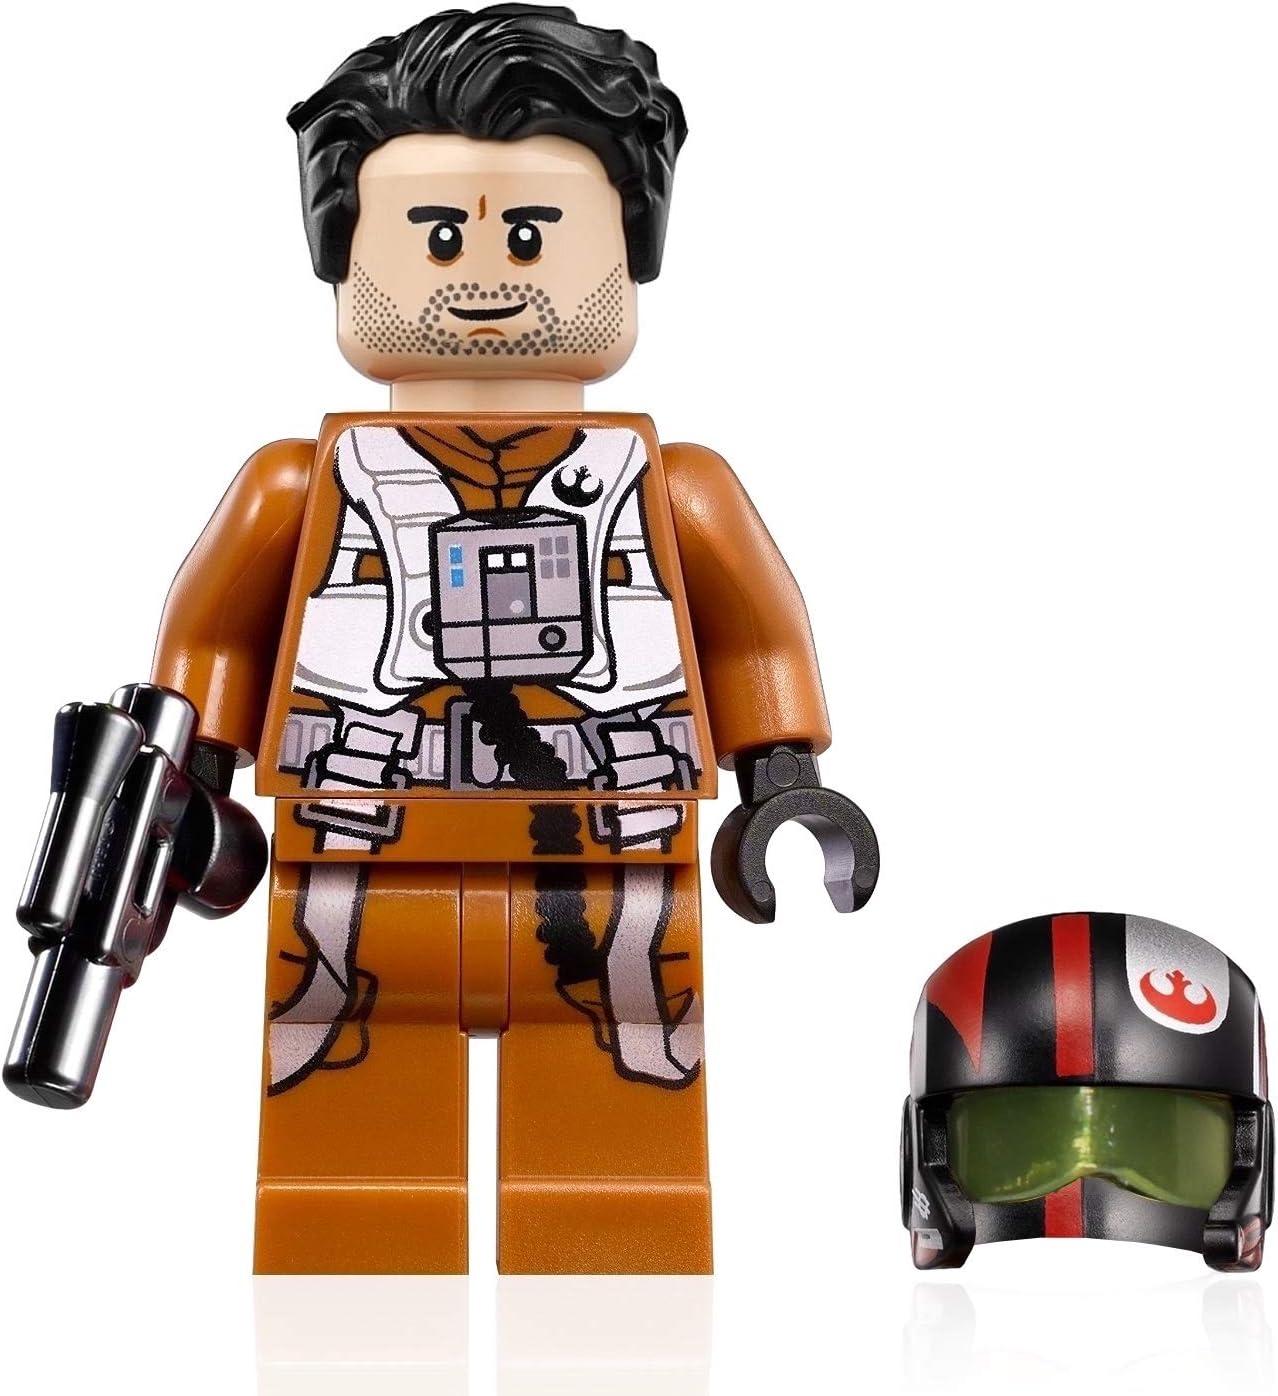 LEGO Star Wars Rise of Skywalker Minifigure - Poe Dameron (Pilot Jumpsuit with Helmet and Blaster) 75102